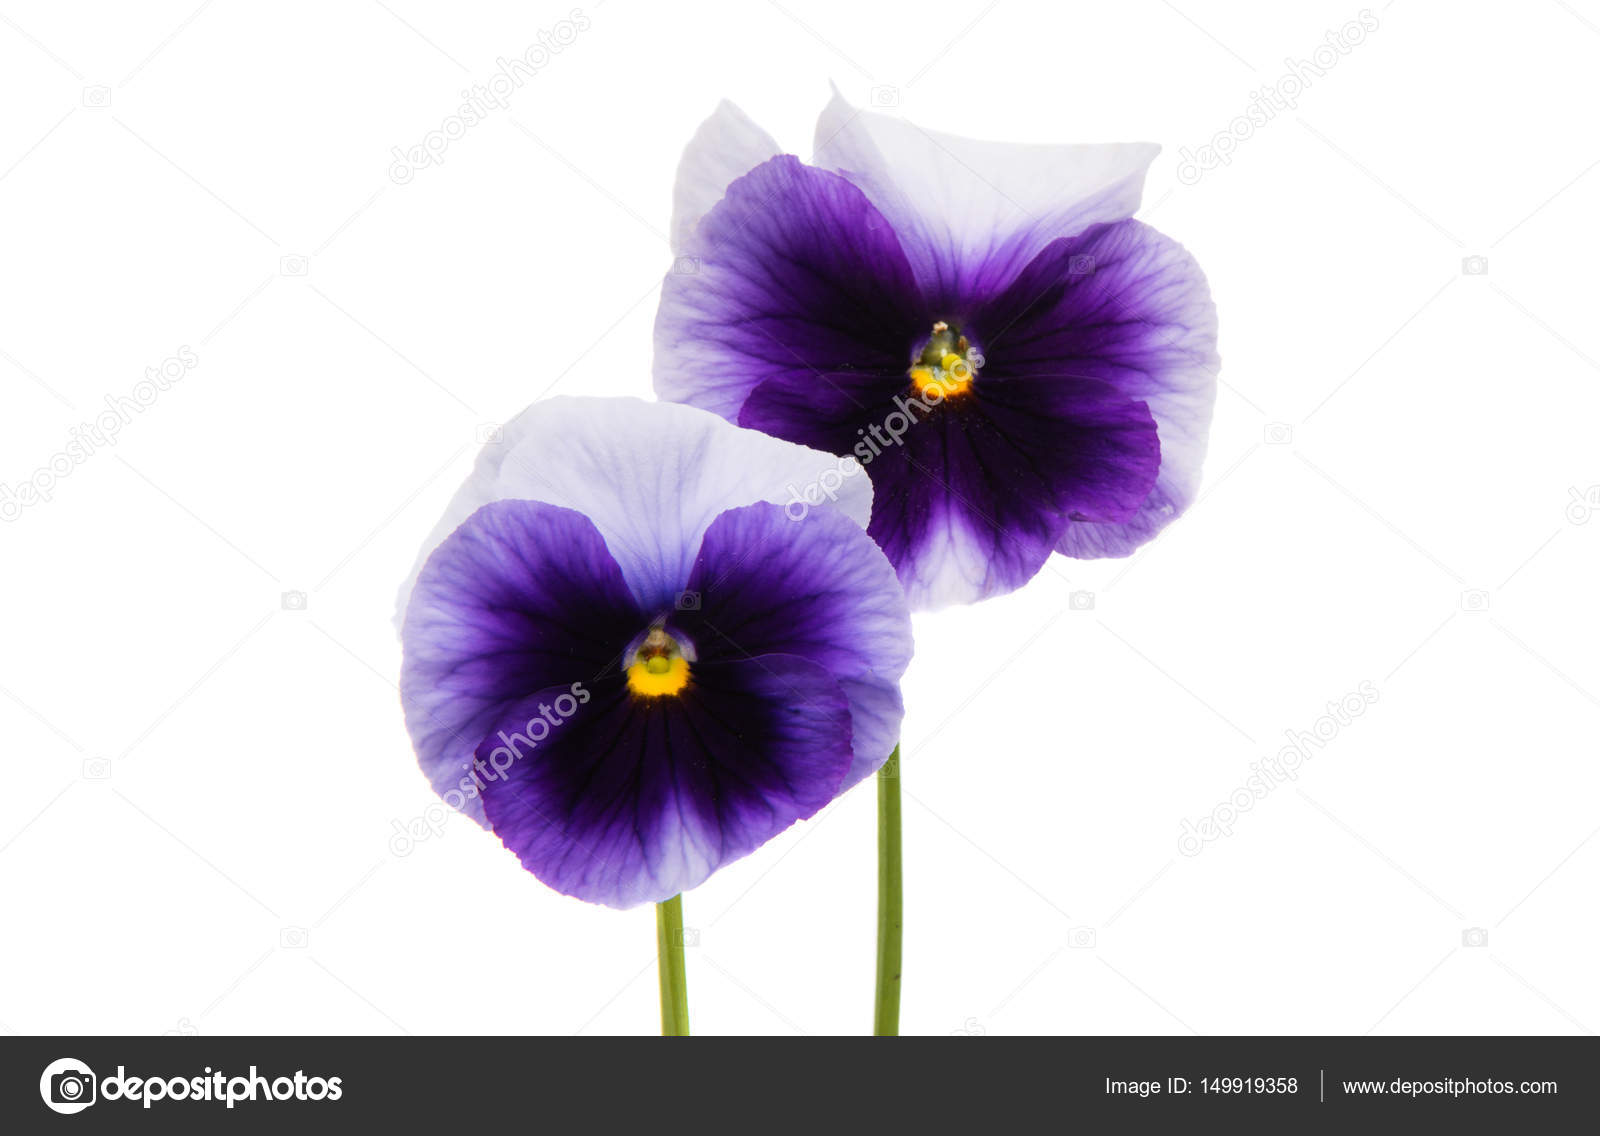 Pansies Flowers Isolated Stock Photo Ksena32 149919358